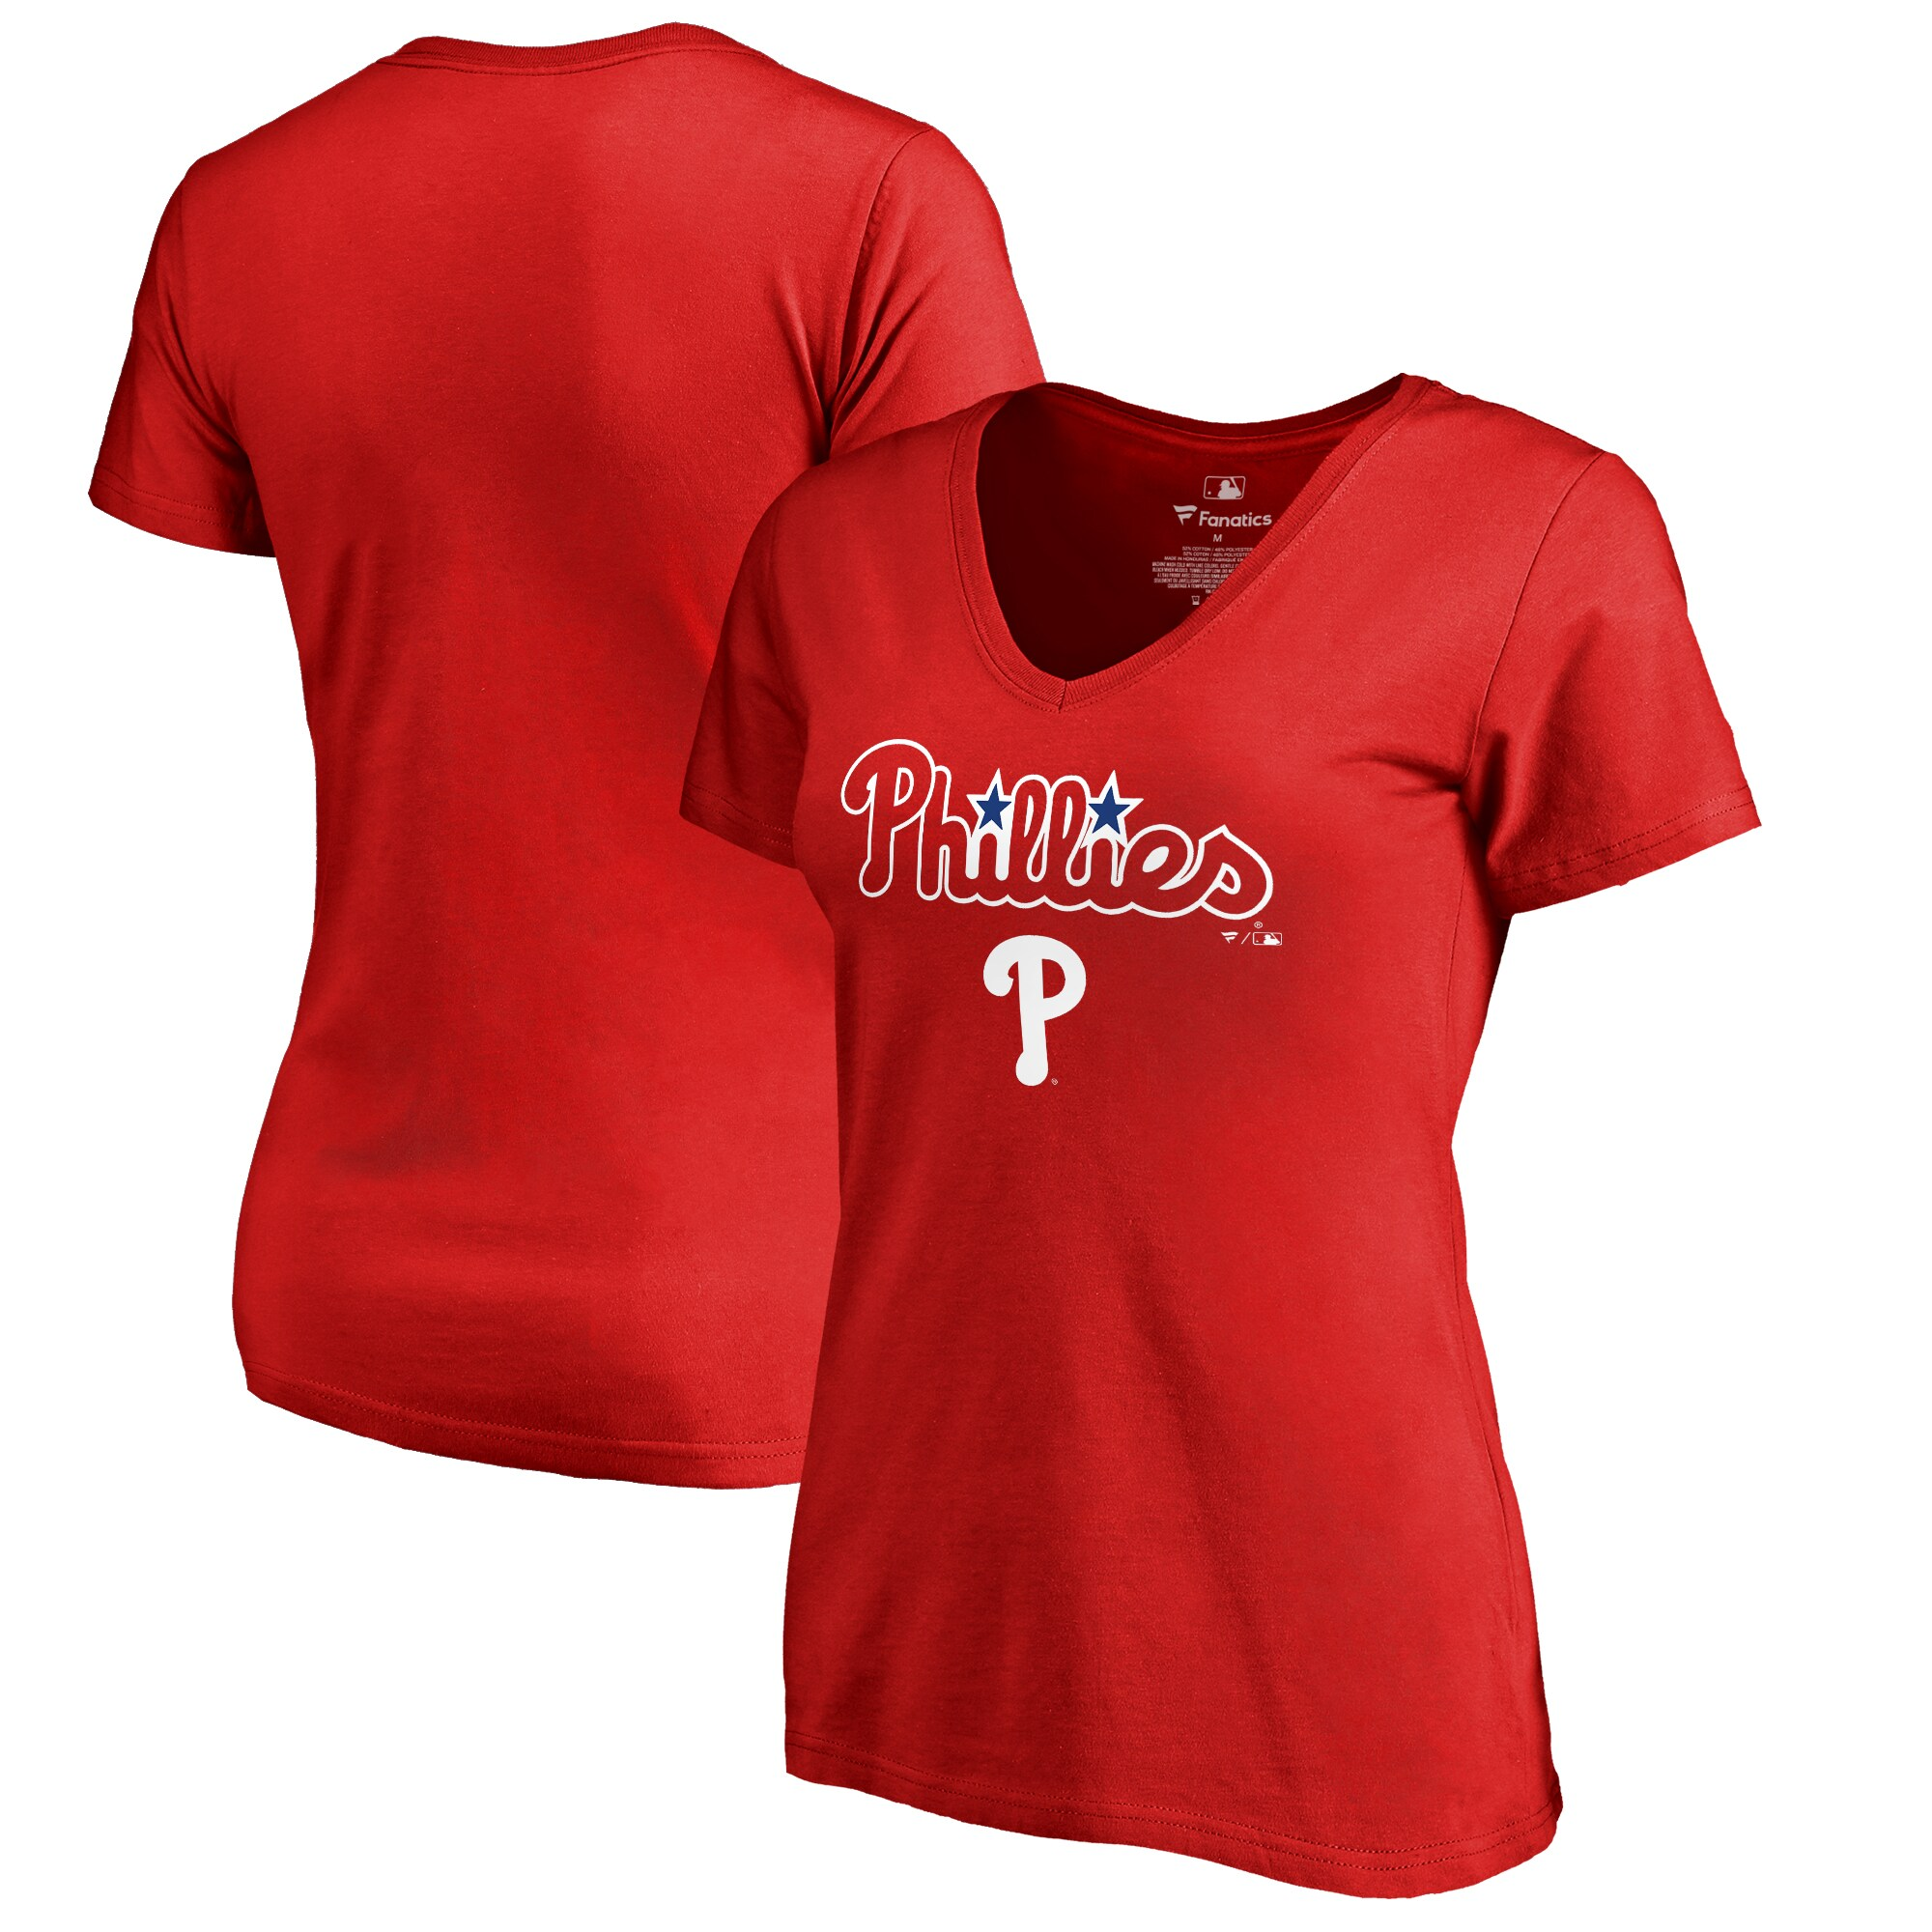 Philadelphia Phillies Fanatics Branded Women's Plus Sizes Team Lockup T-Shirt - Red